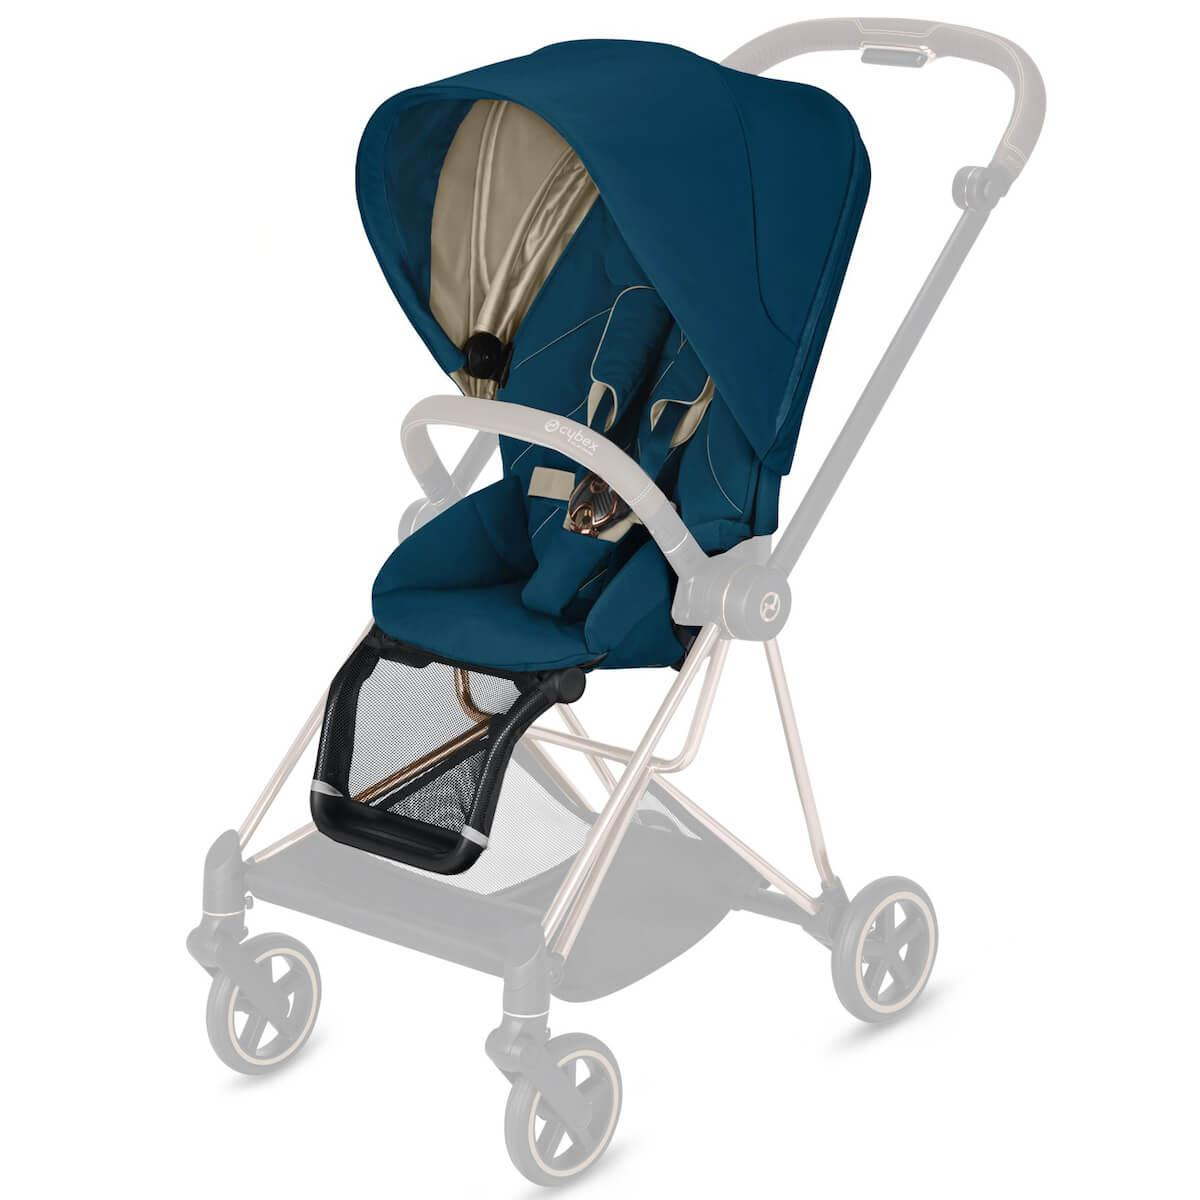 Asiento-pack silla MIOS Cybex Mountain blue-turquoise